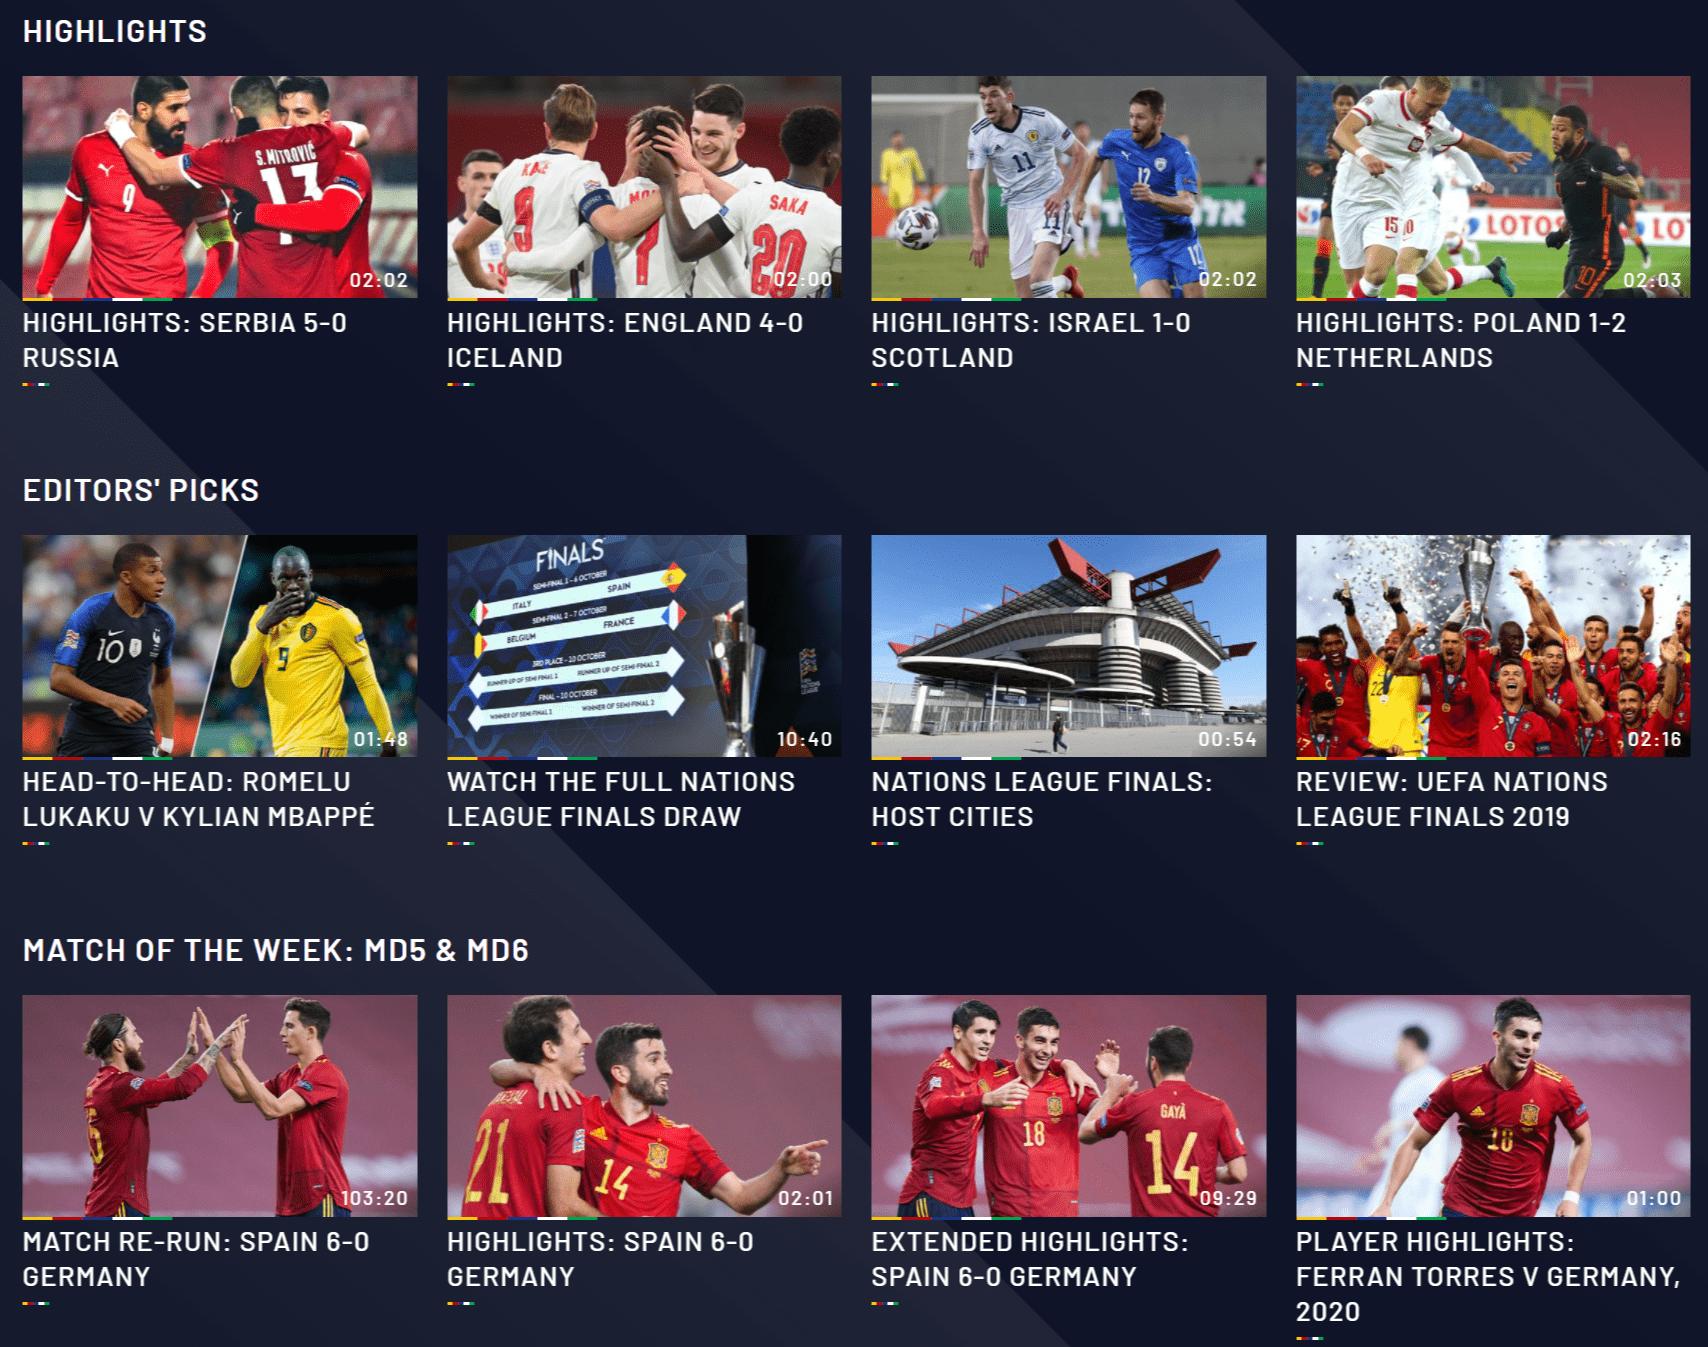 UEFA_Nations_League_UEFAtv_過去のハイライト動画_フルマッチ動画